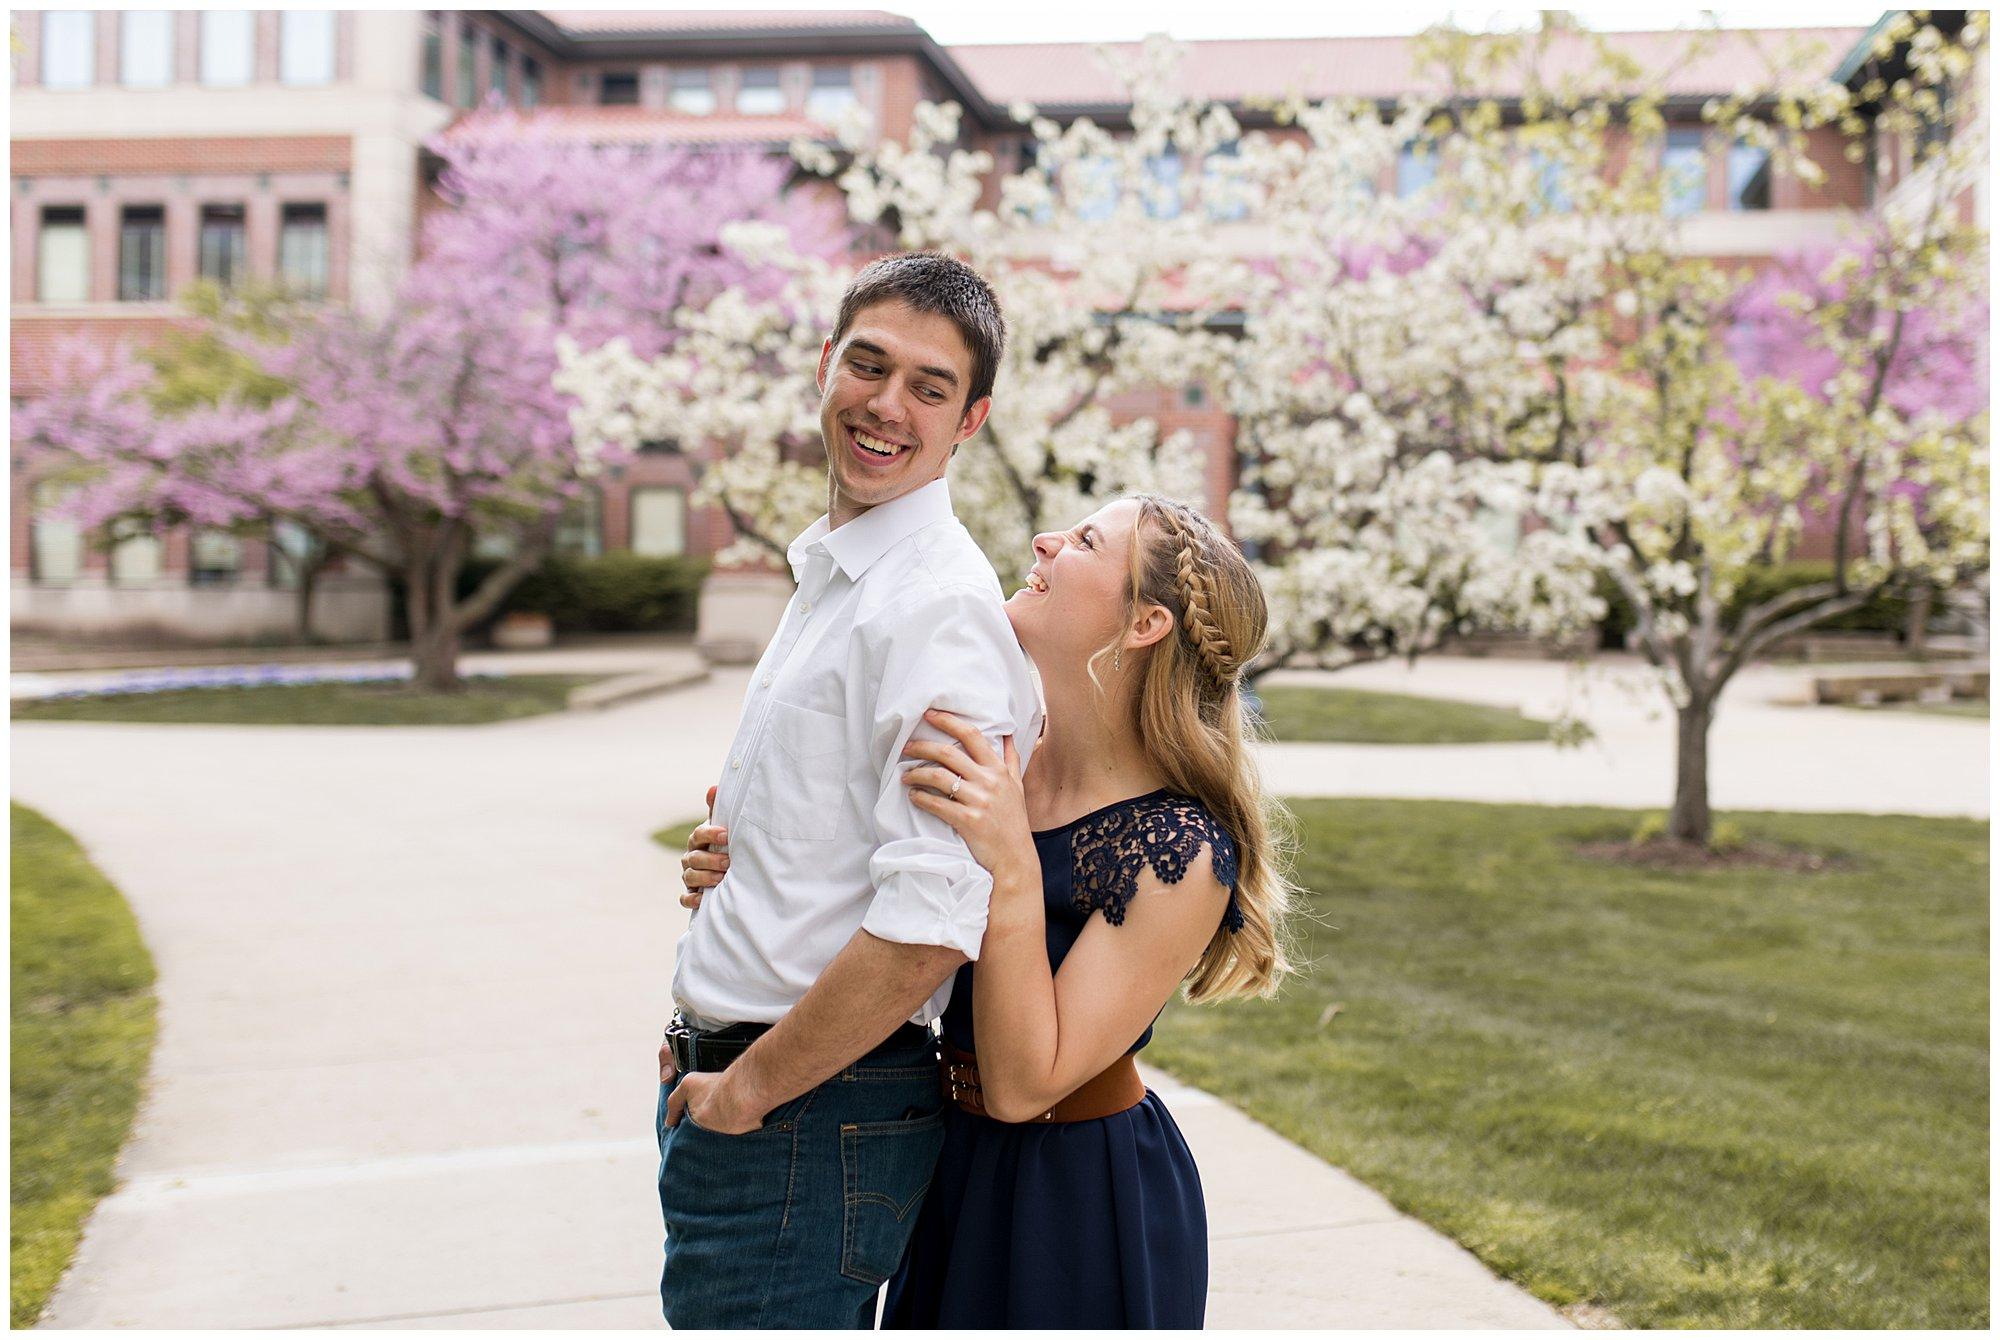 groom looks over shoulder at bride during engagement session on campus